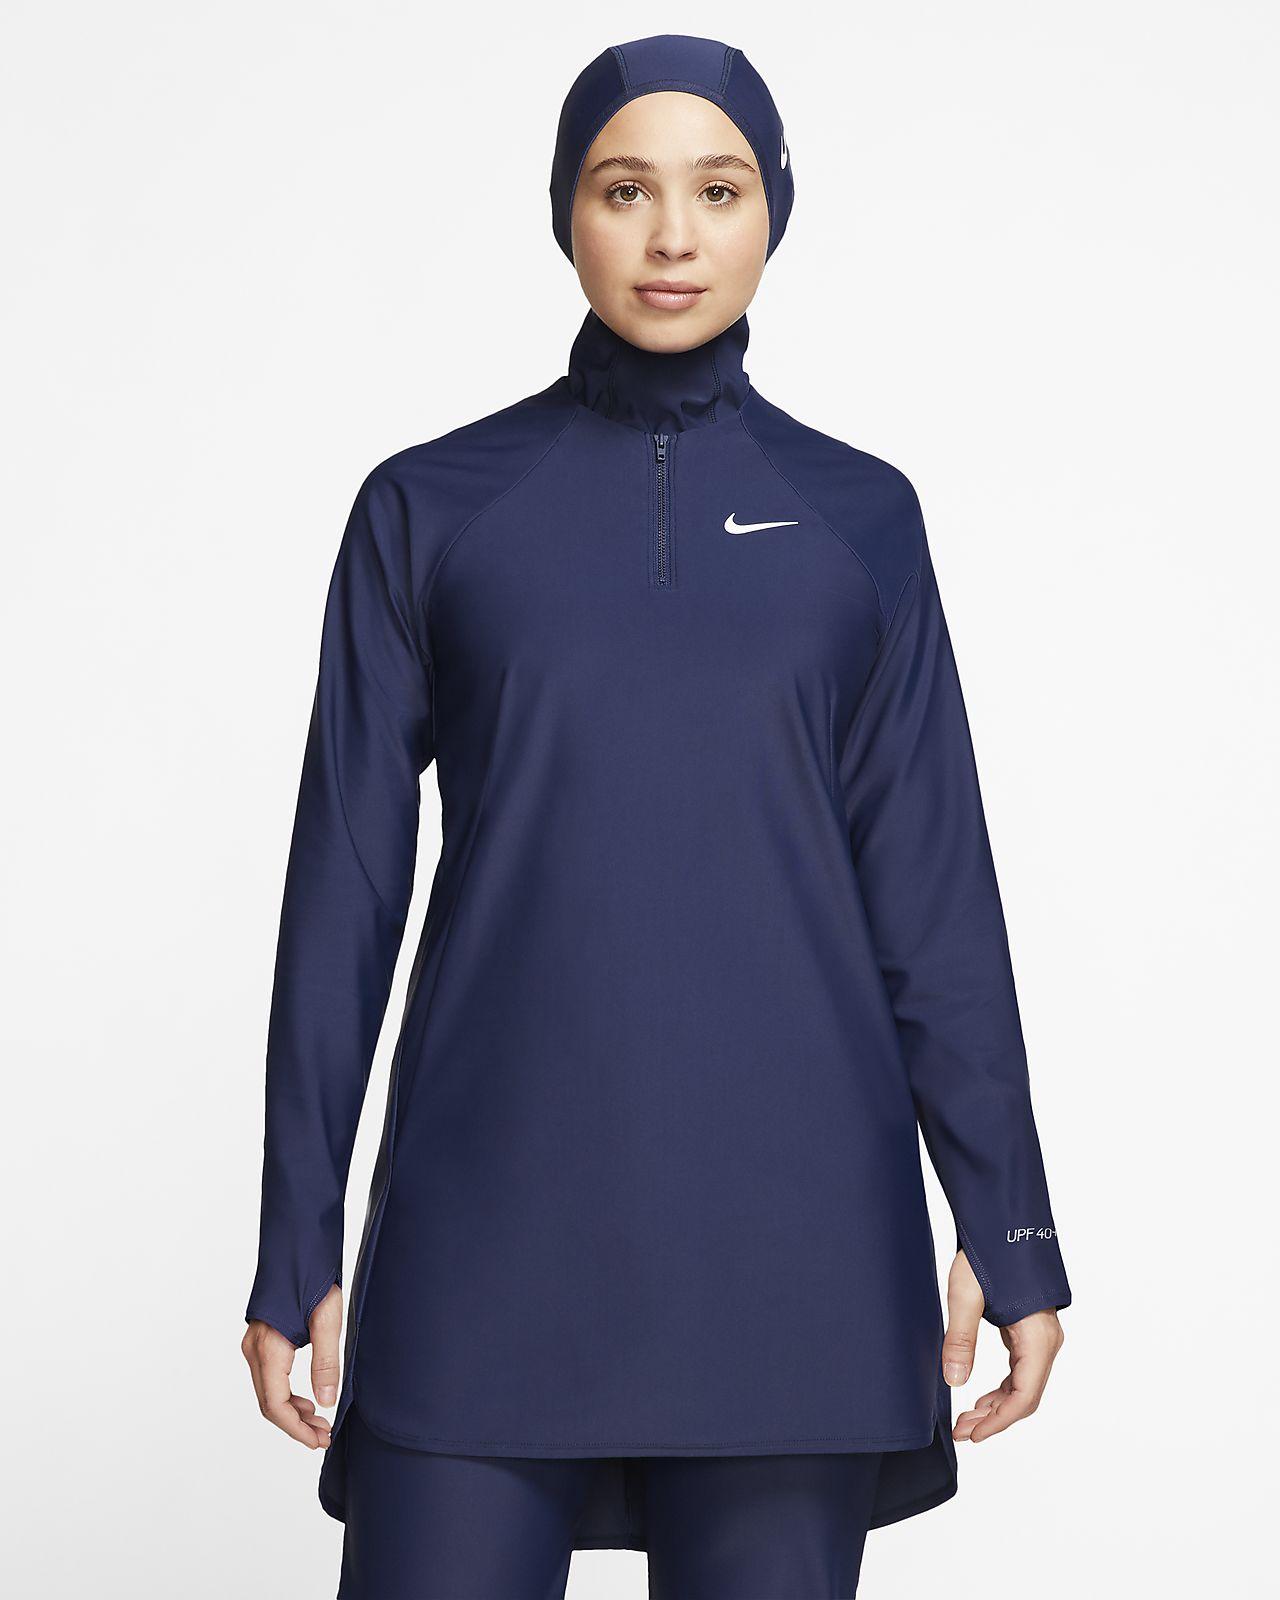 Nike Victory Women's Full-Coverage Swim Tunic